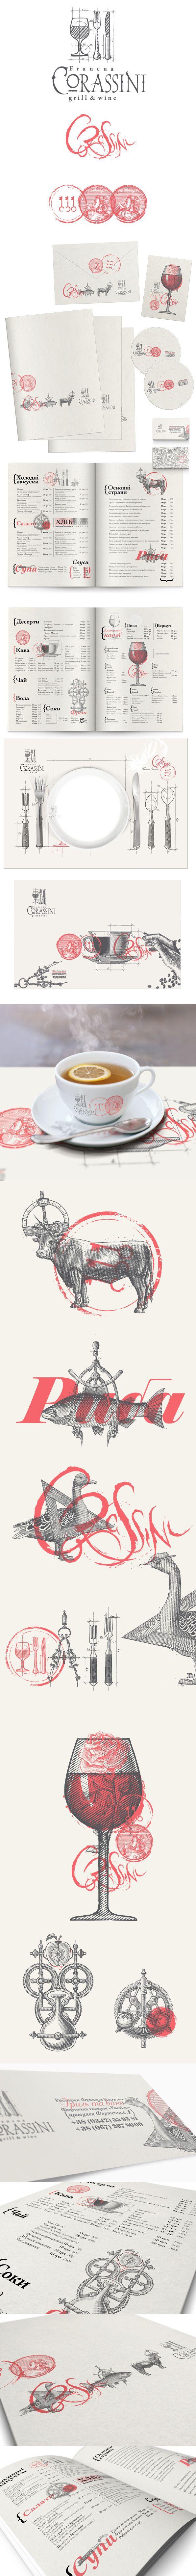 Corassini branding by Yaroslav Shkriblyak, via Behance